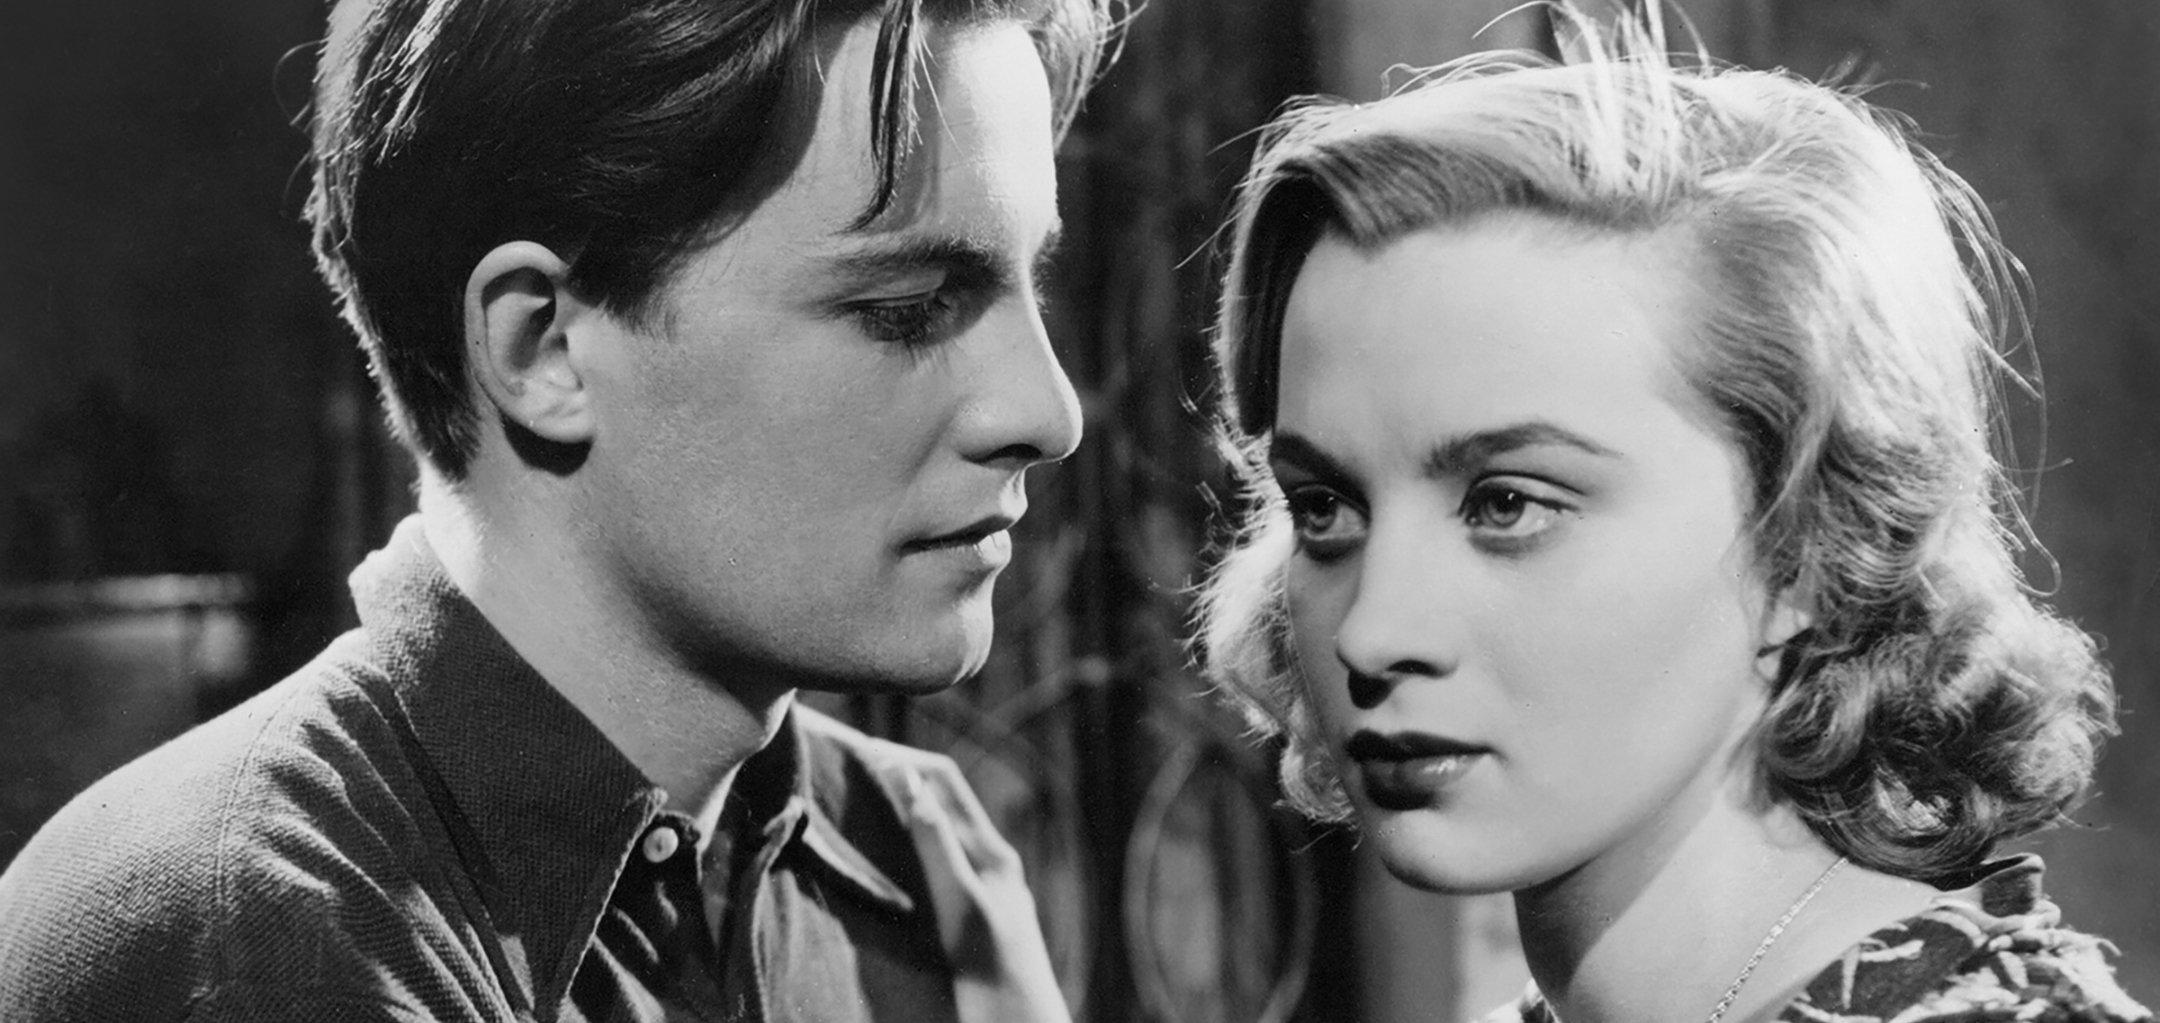 Alf Kjellin and Mai Zetterling in a still from 'Torment' (1944)